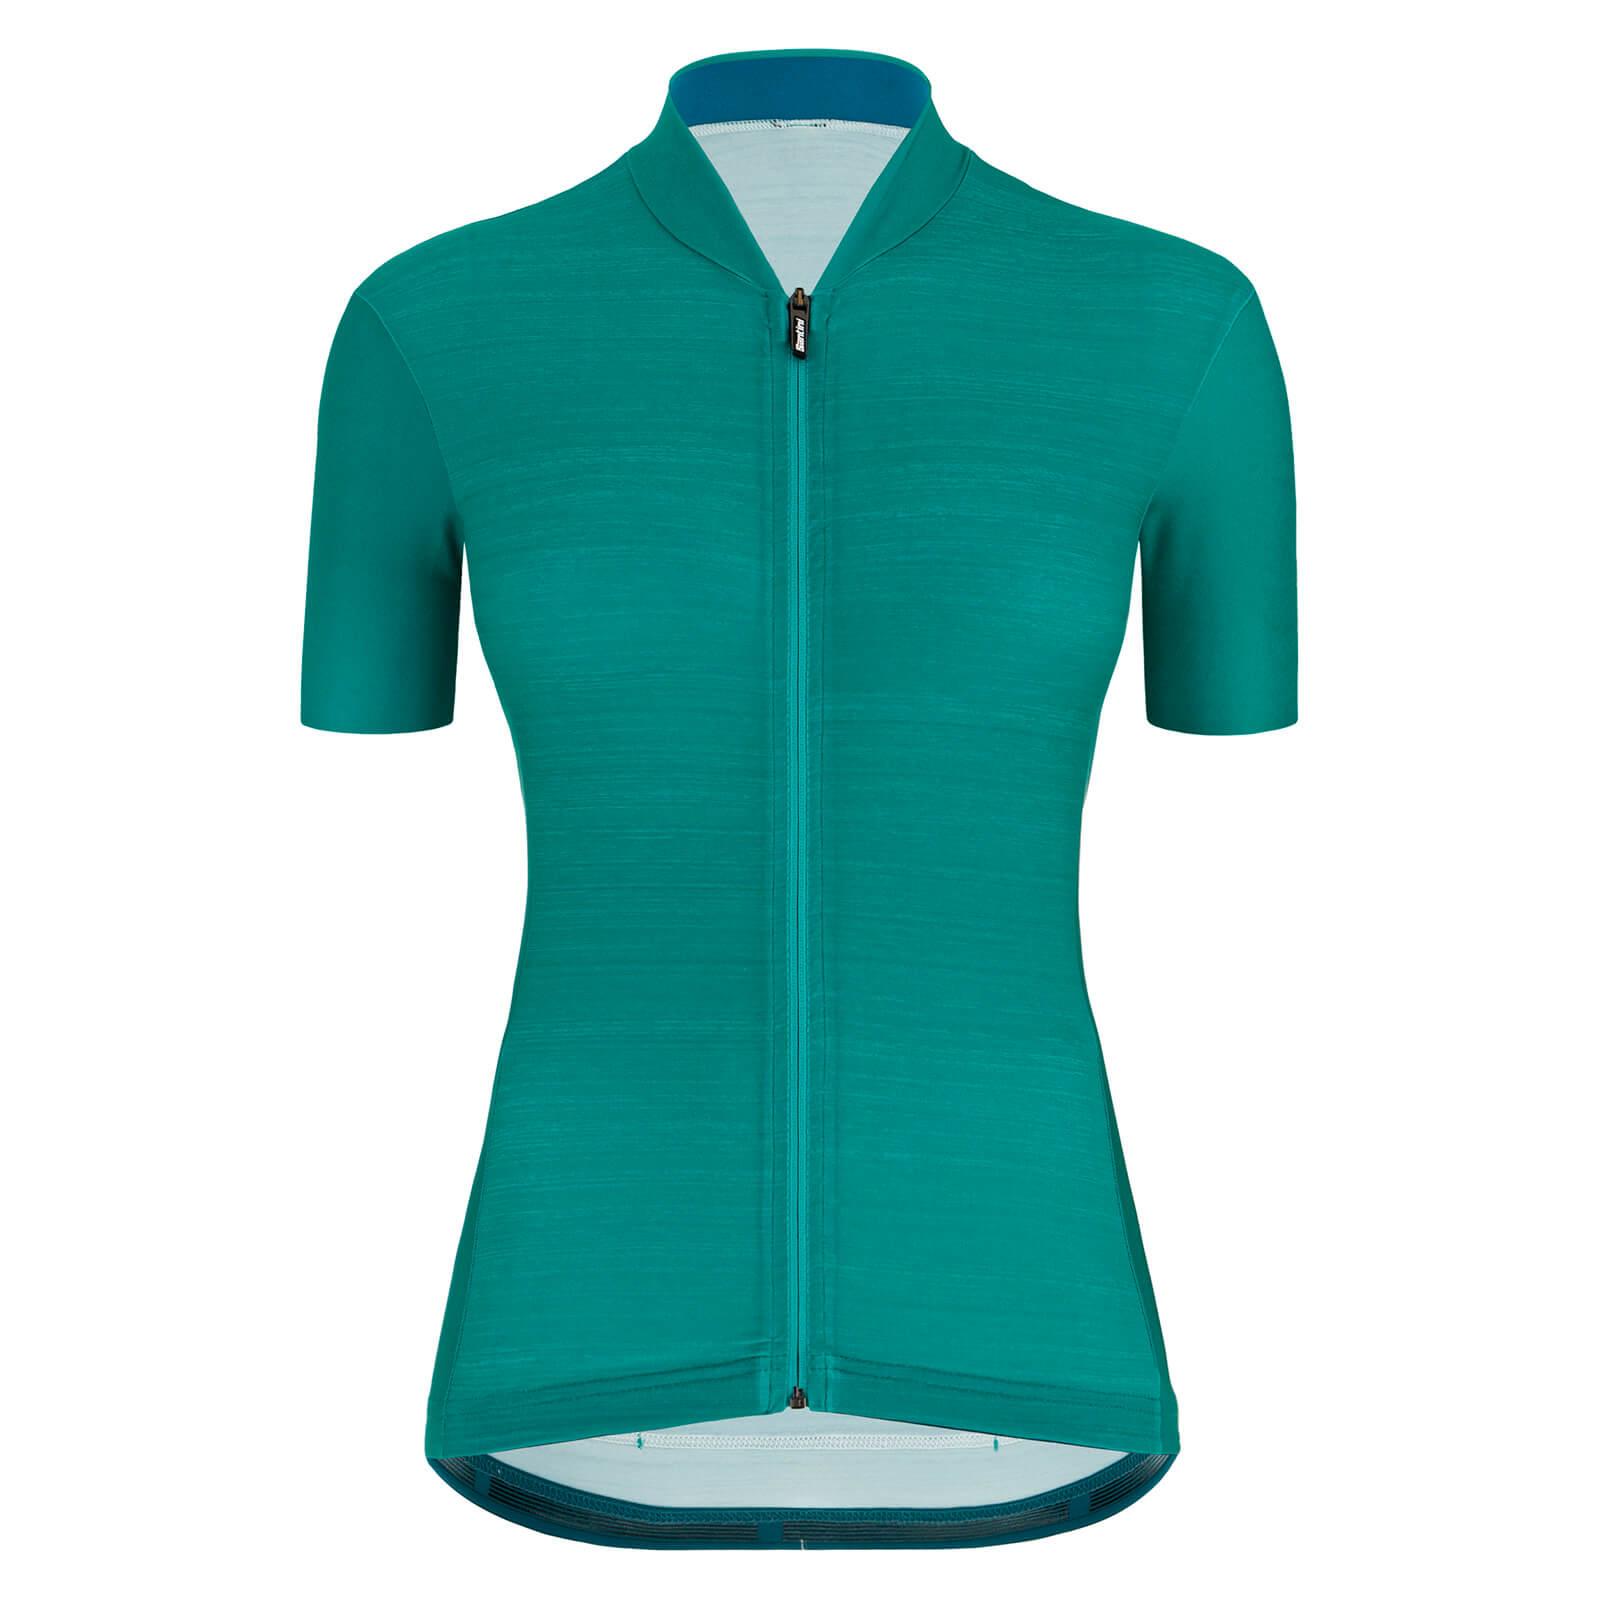 Santini Women's Colore Jersey - M - Petrol Green